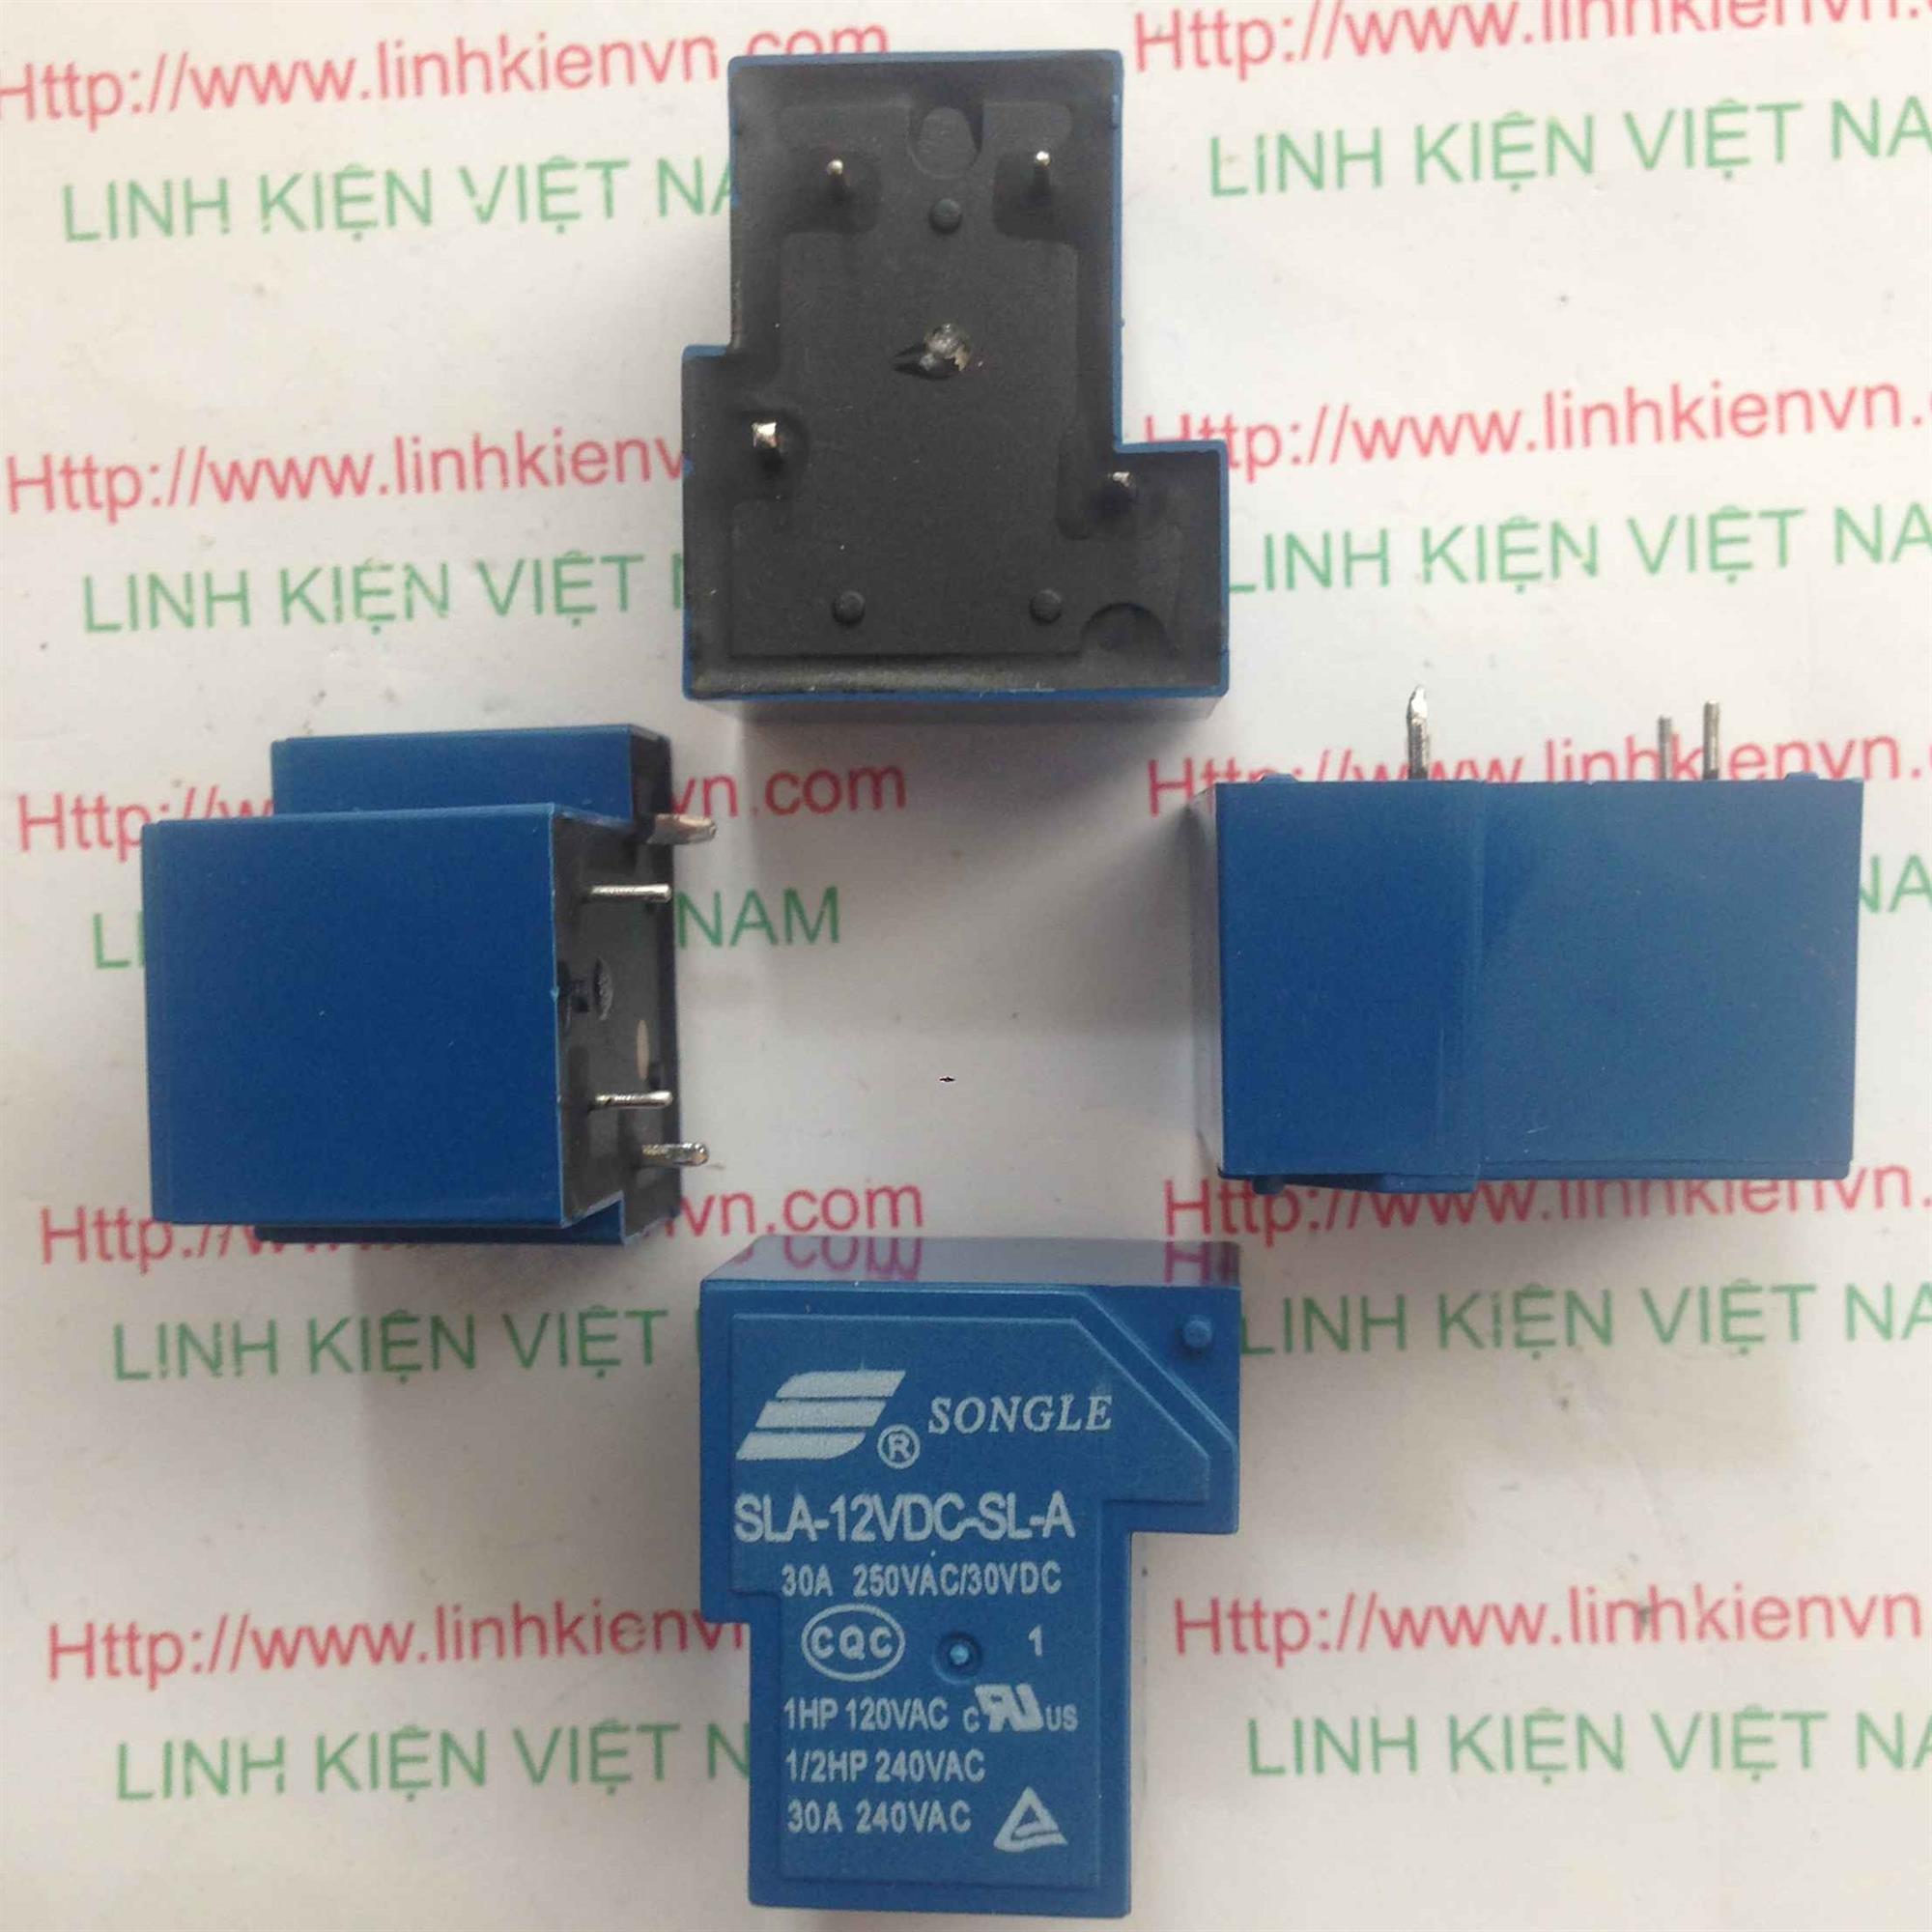 Relay 12V 30A 220V | SLA-12VDC-SL-A - A1H9(KB4H3)